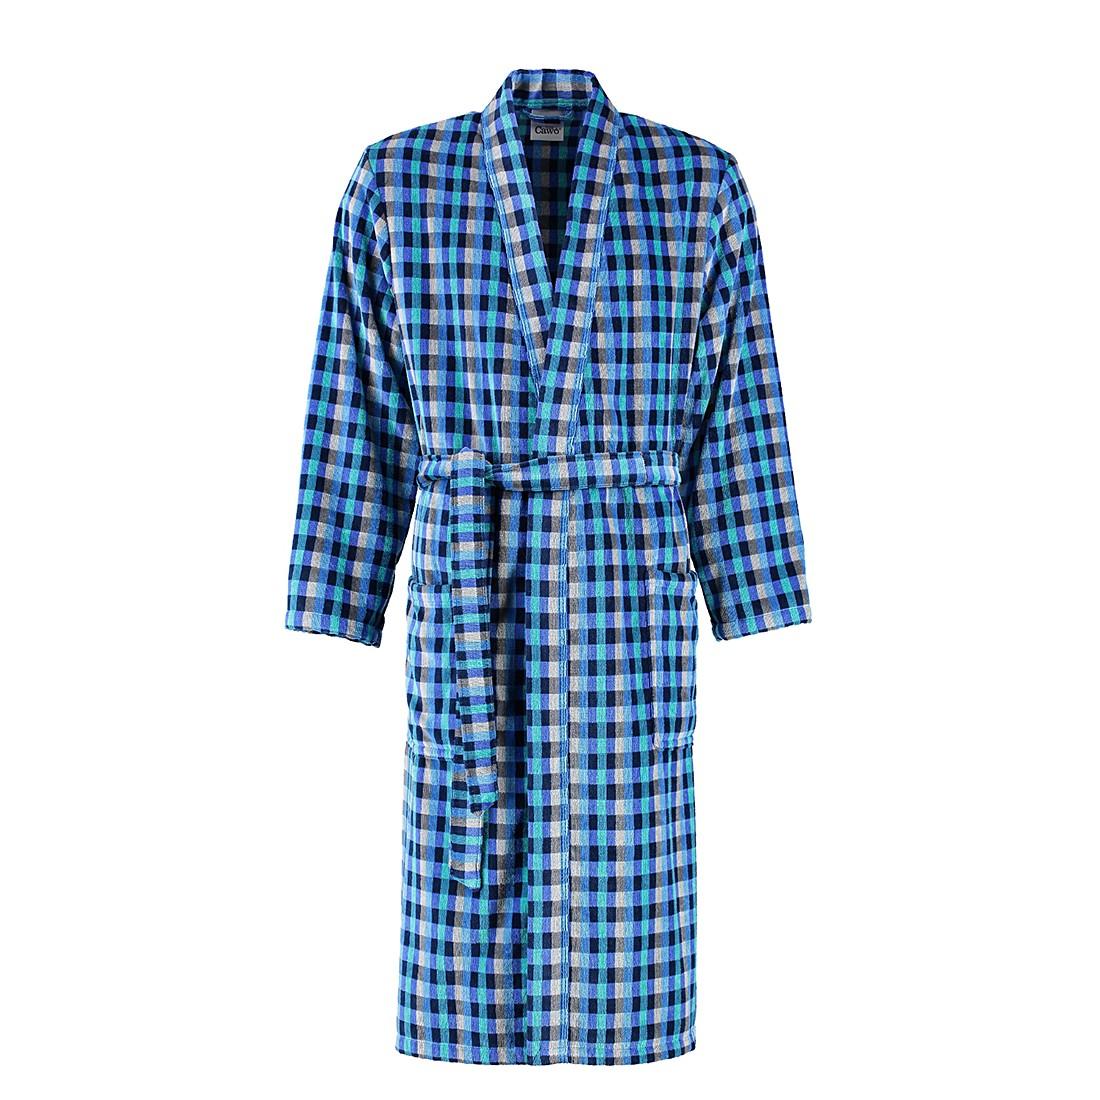 Bademäntel Herren 2842 – Baumwolle – Aqua – L, Cawö jetzt bestellen